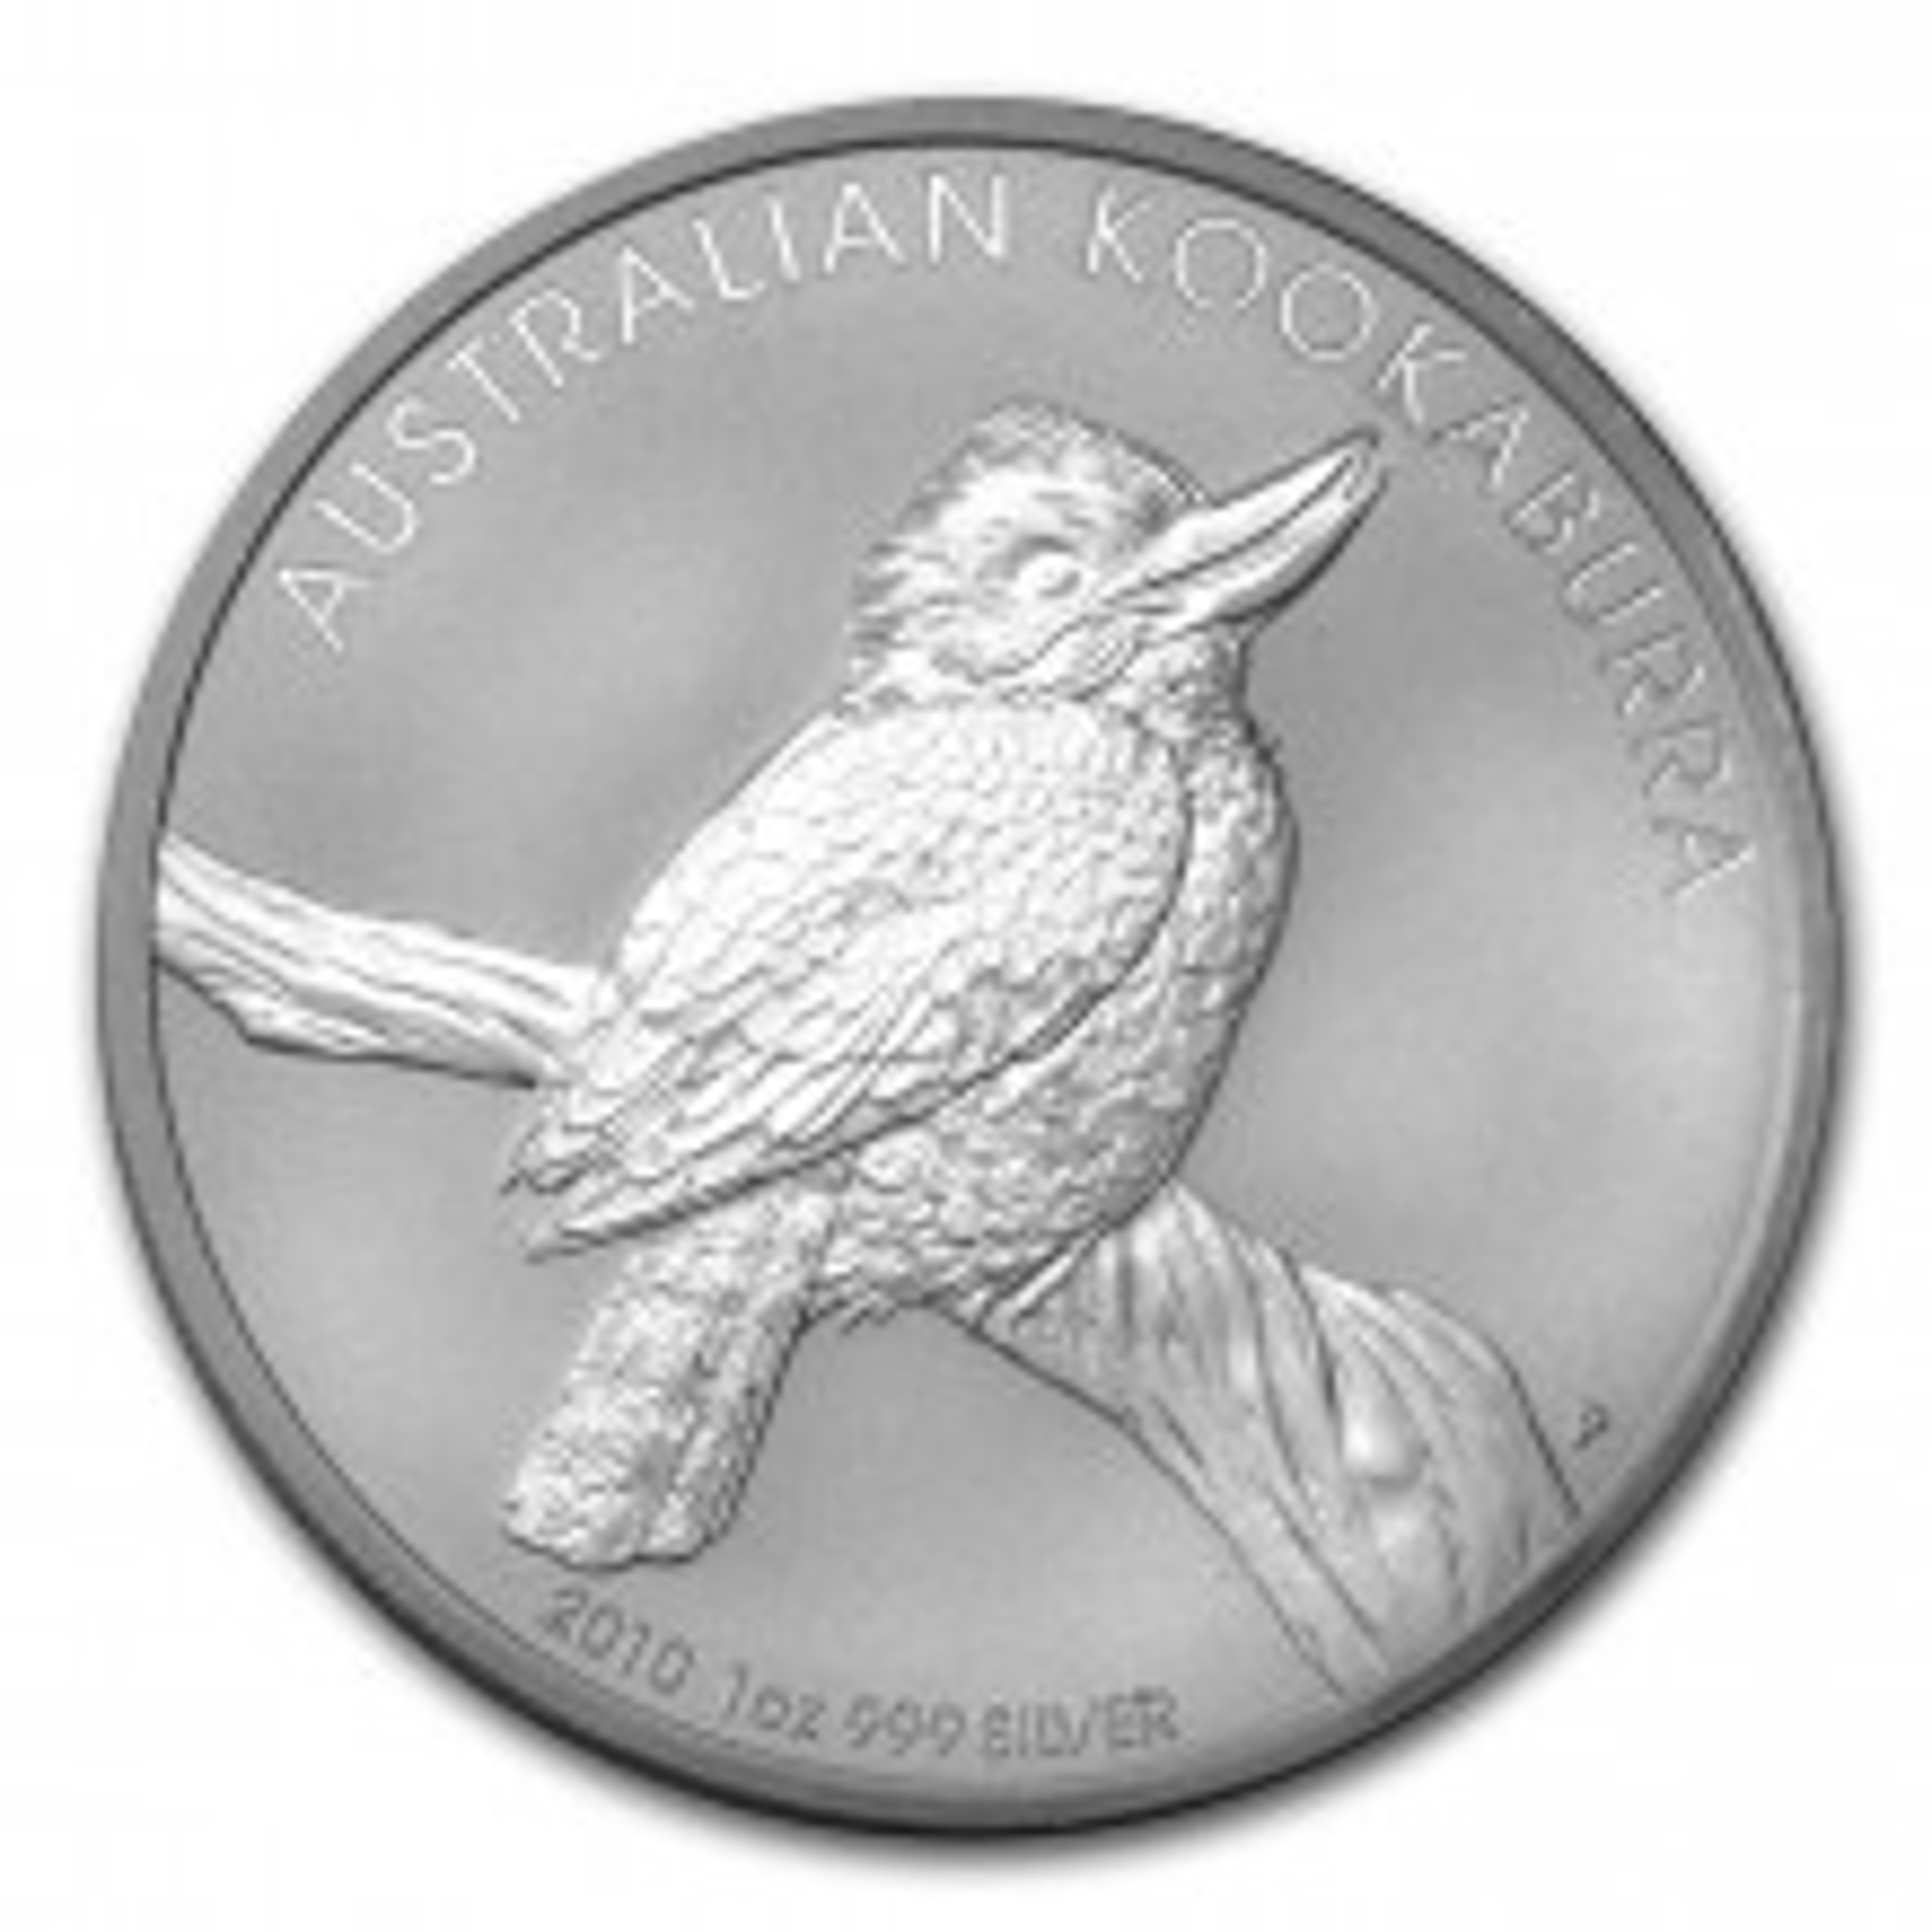 1 Troy ounce zilver munt Kookaburra 2010